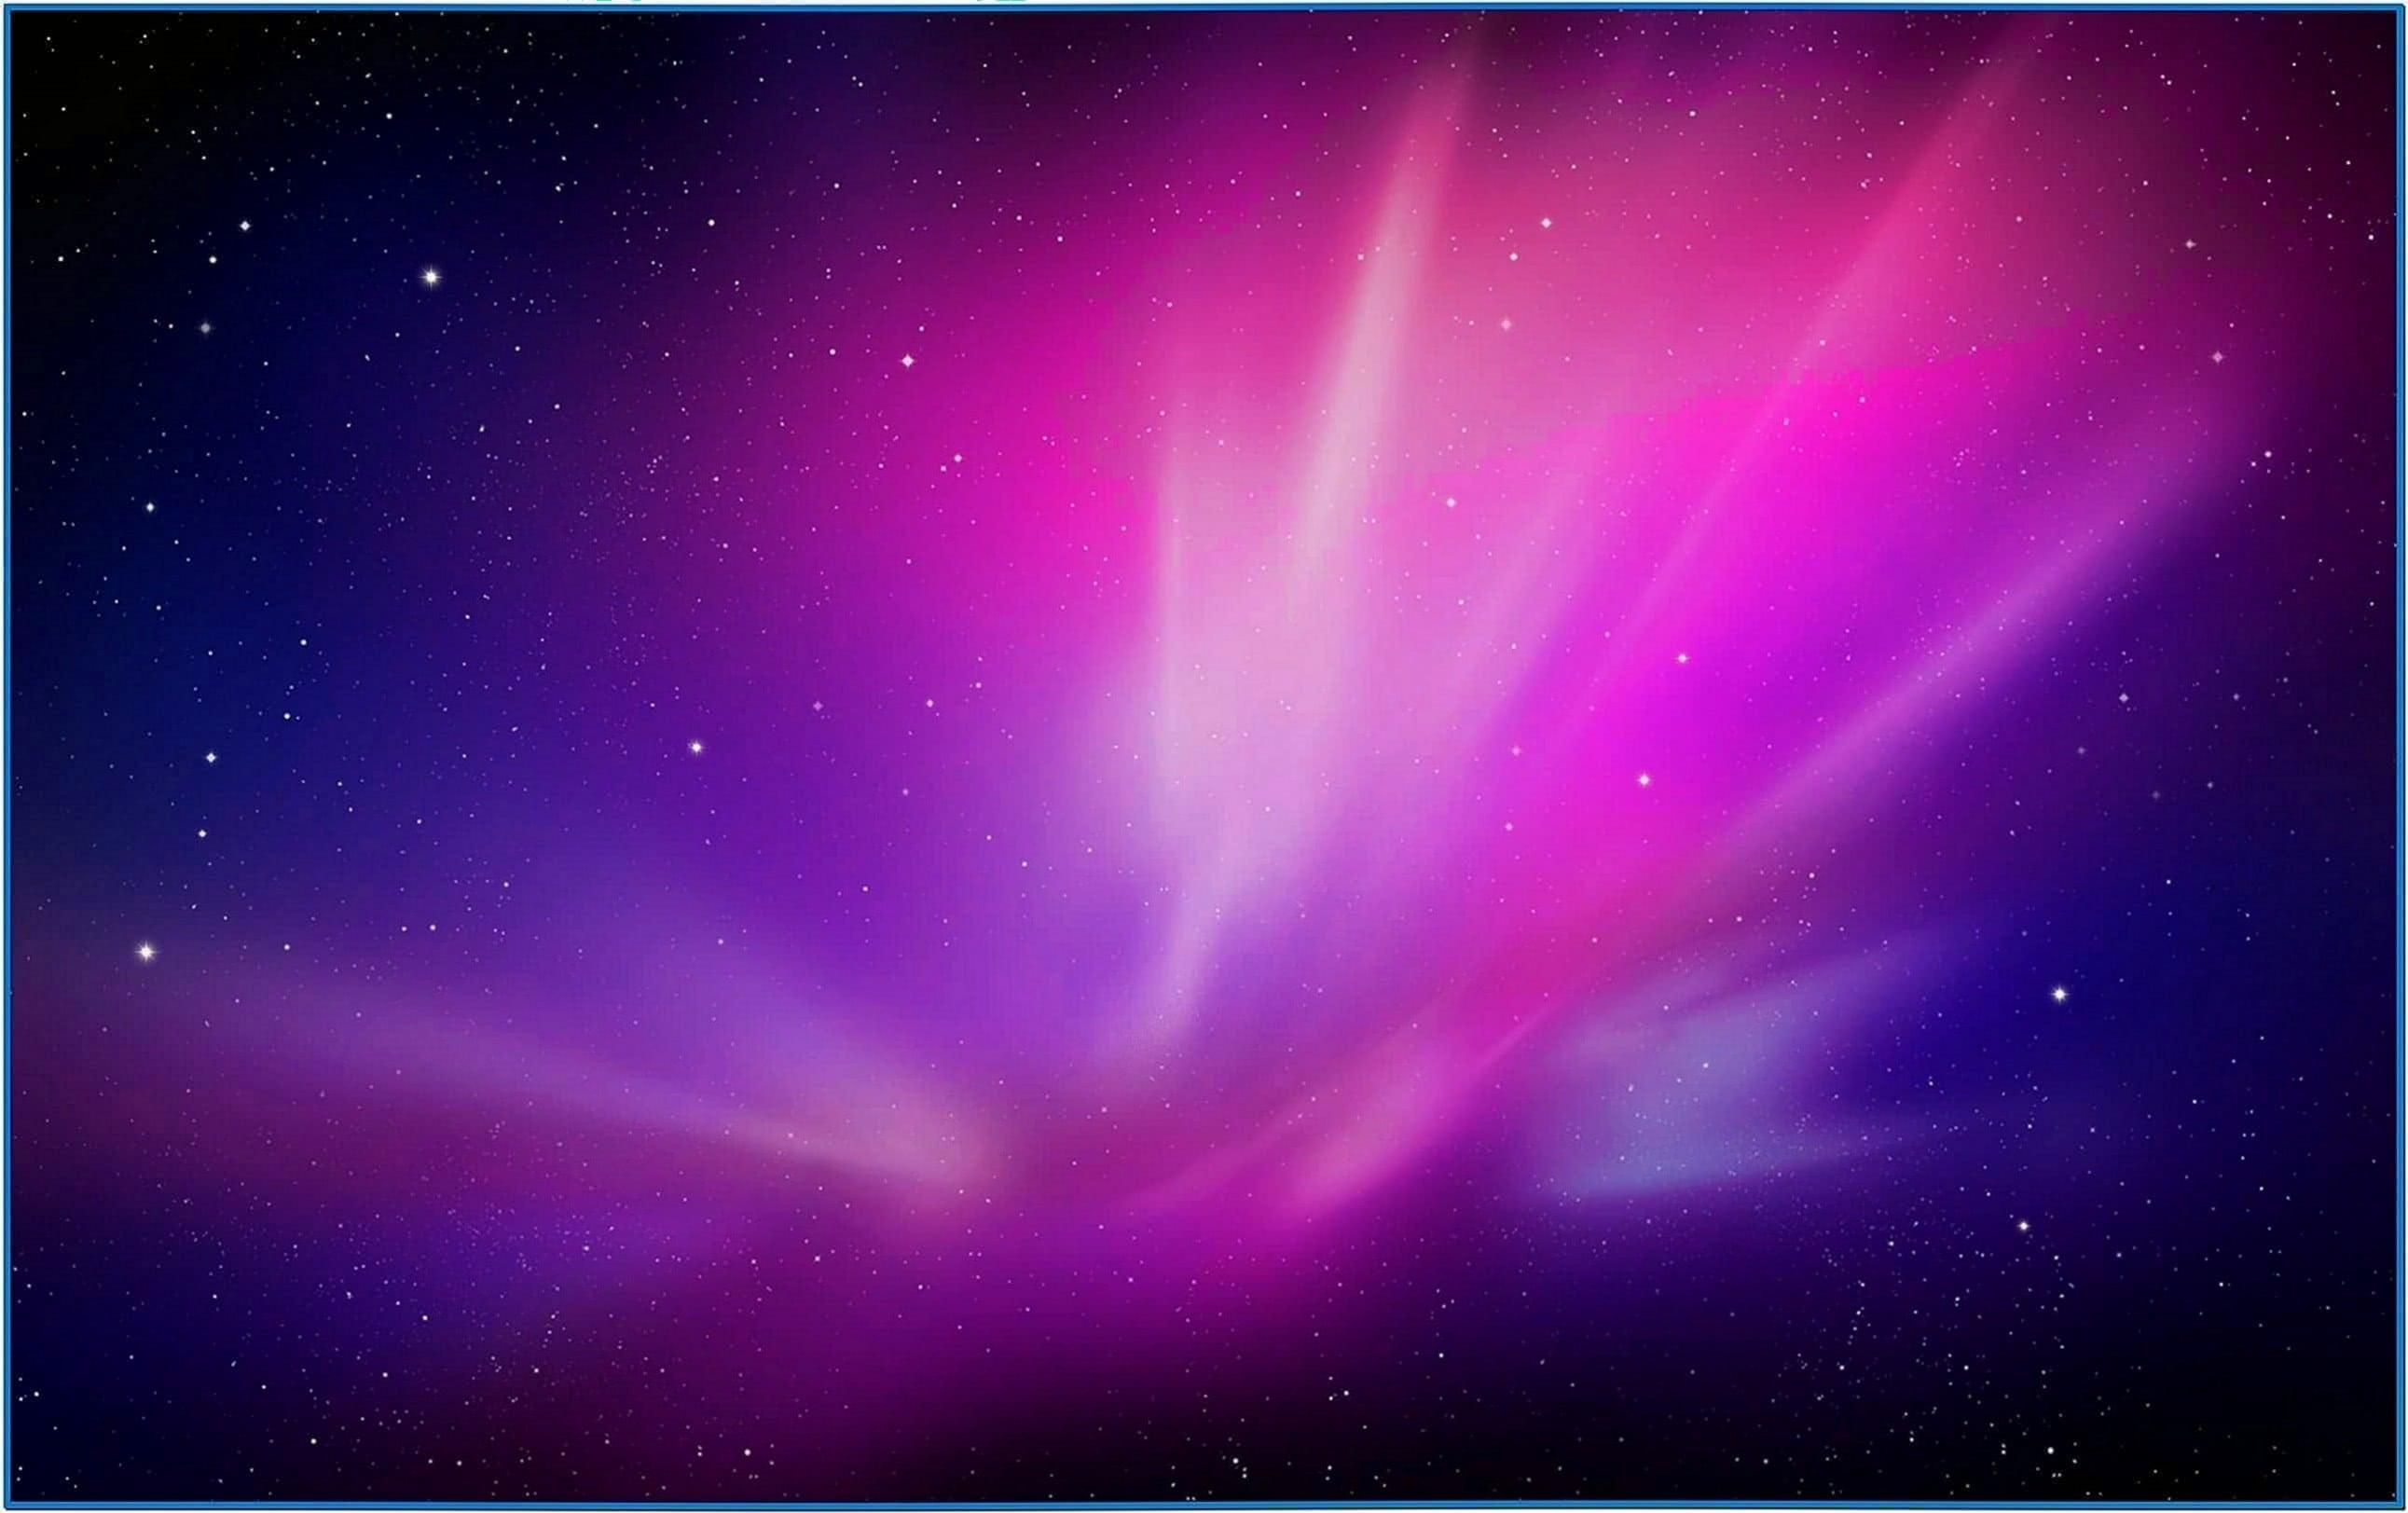 Screensavers Mac os x 10.6